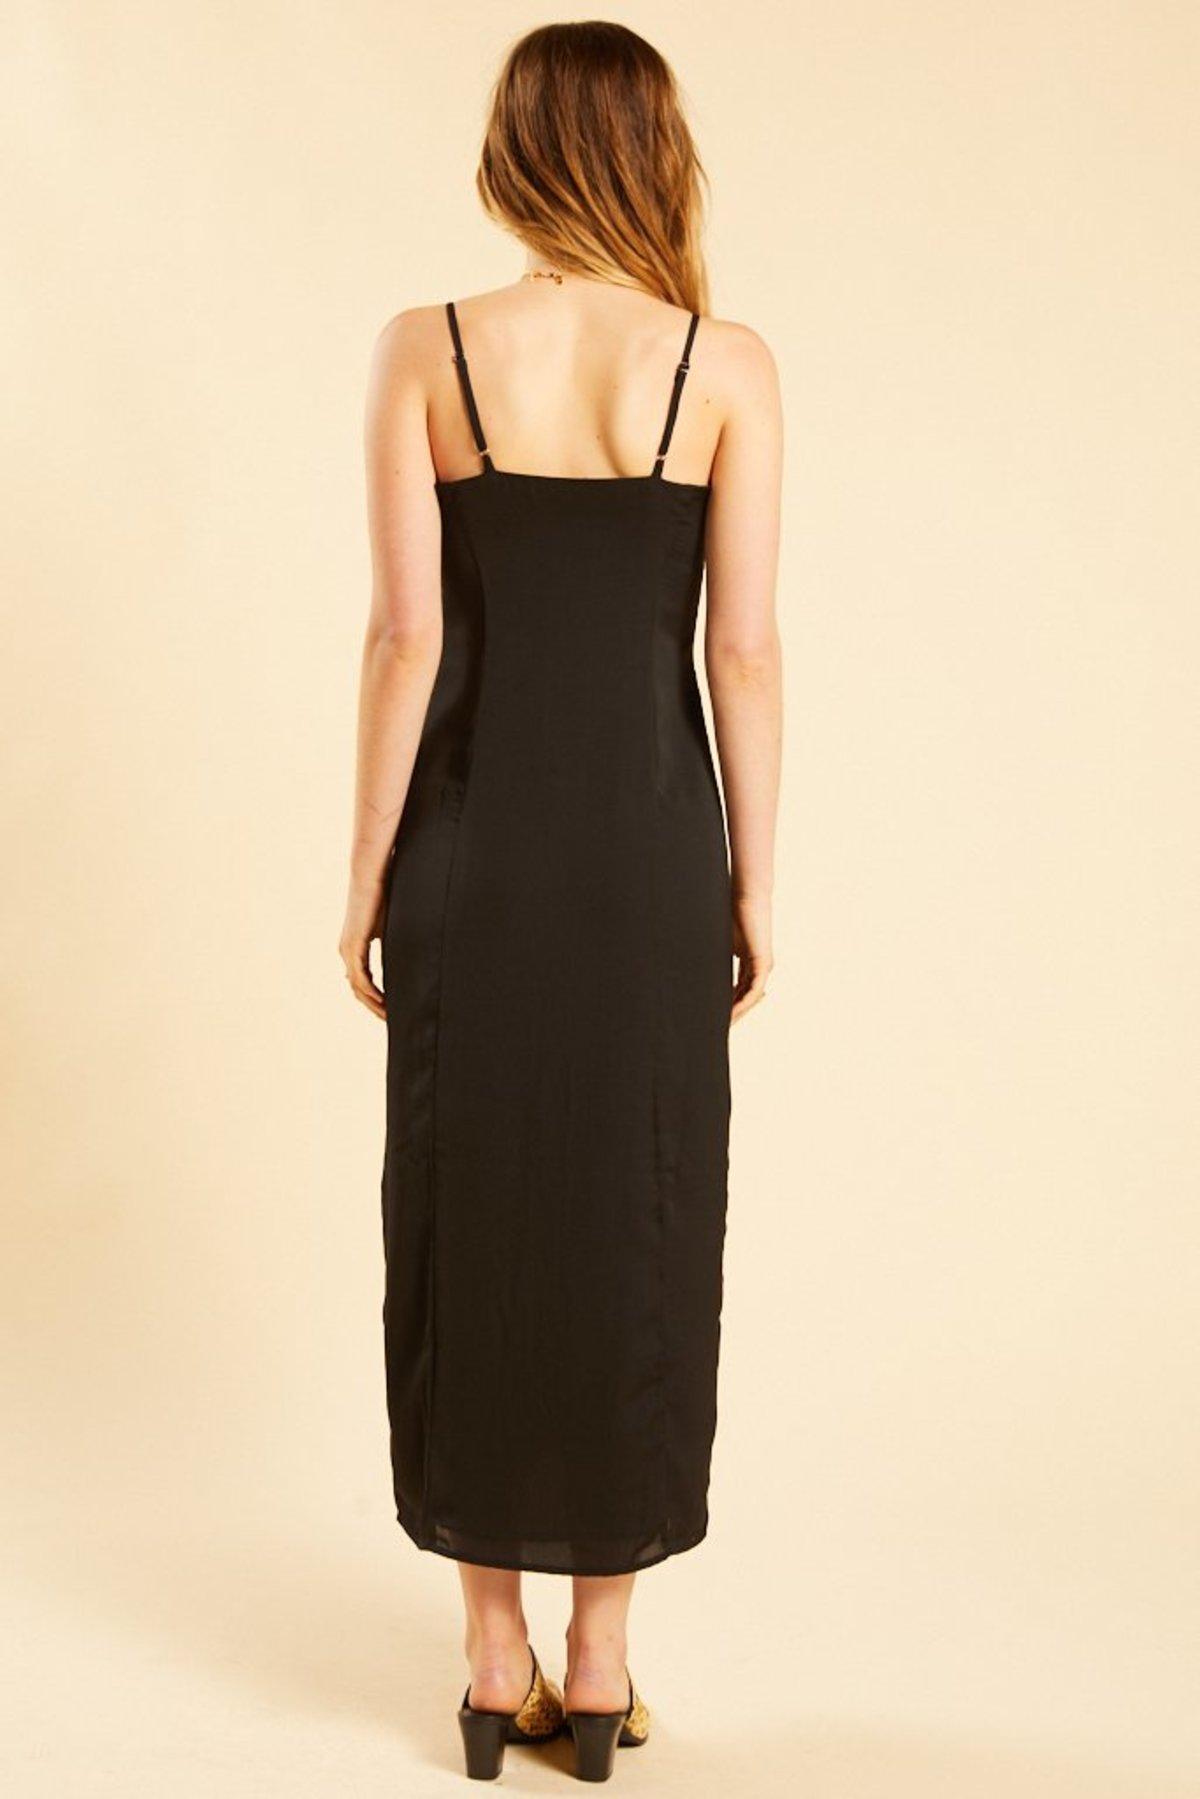 black Amuse Society Island fever dress